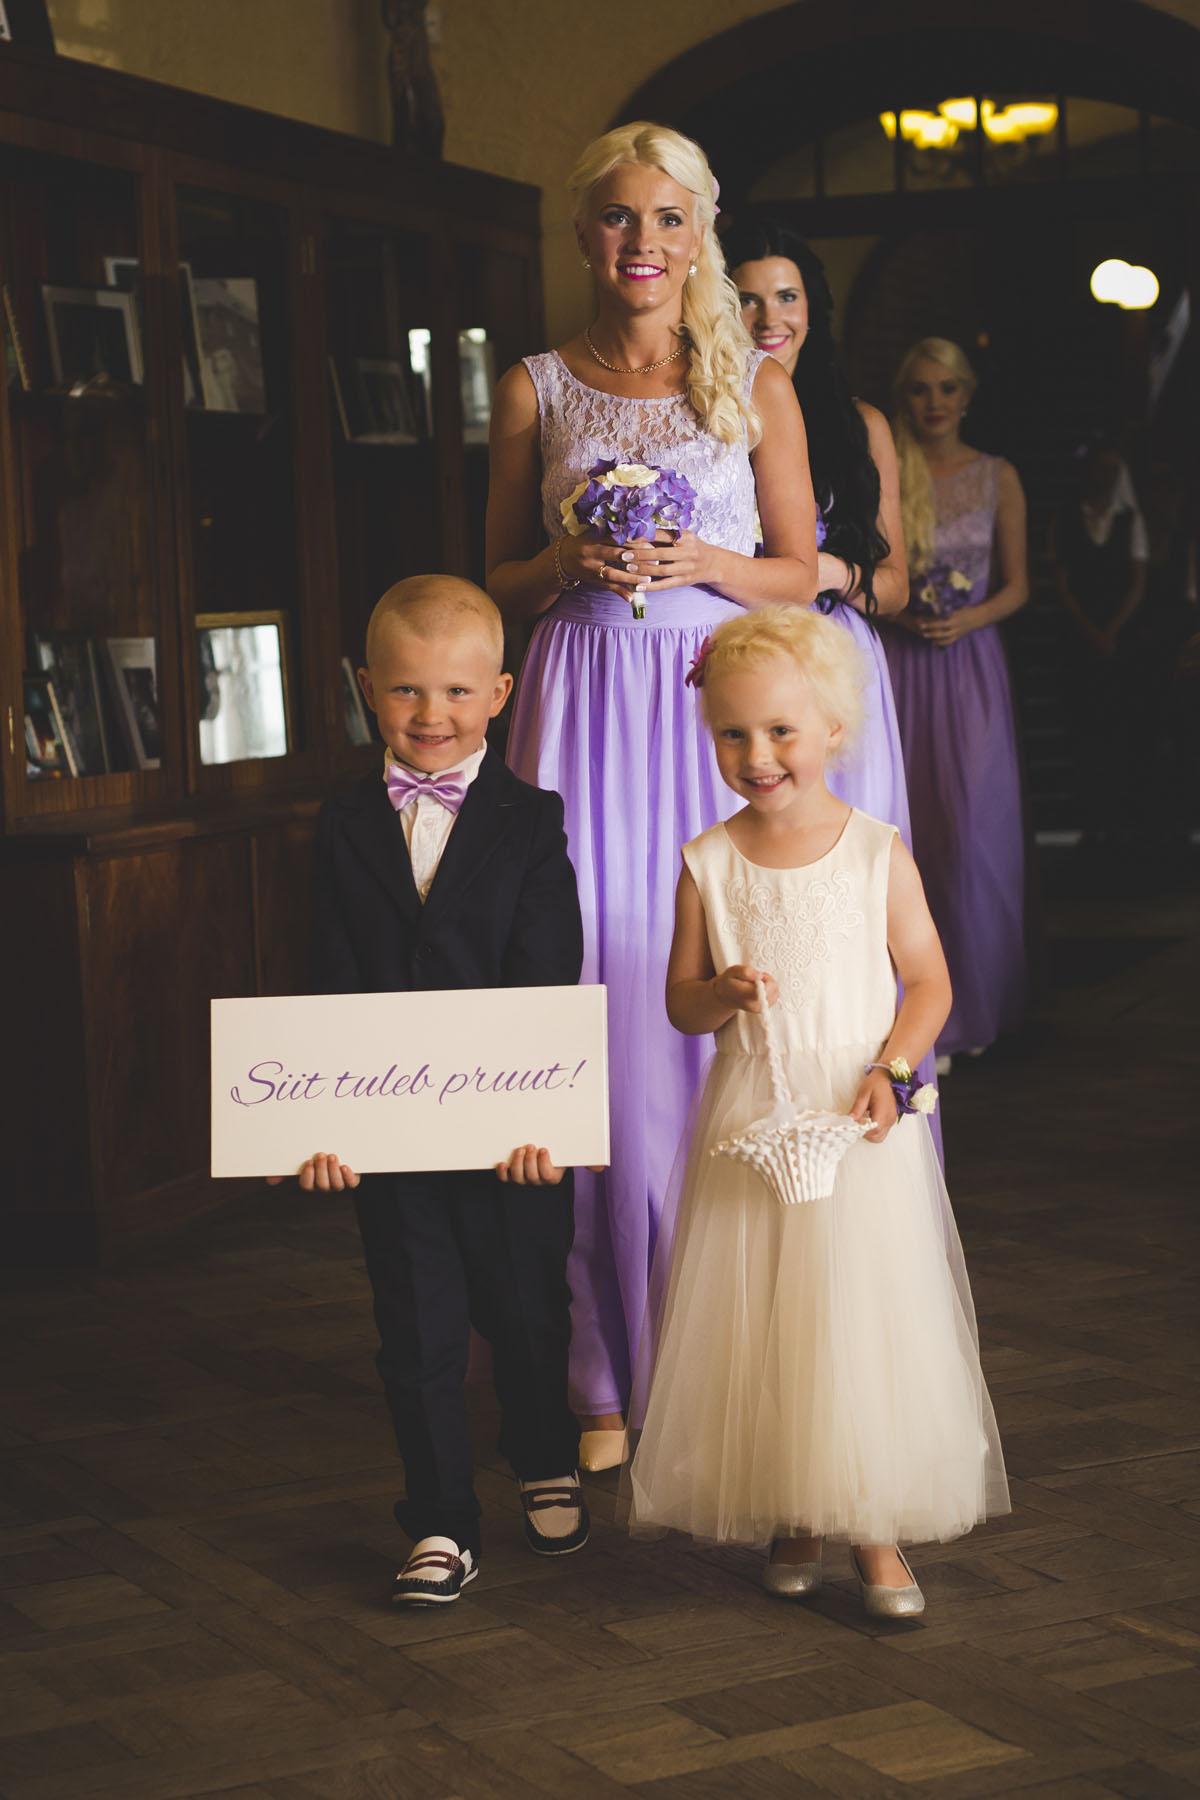 wedding-photos-085-estonia-wedding-photographer.jpg